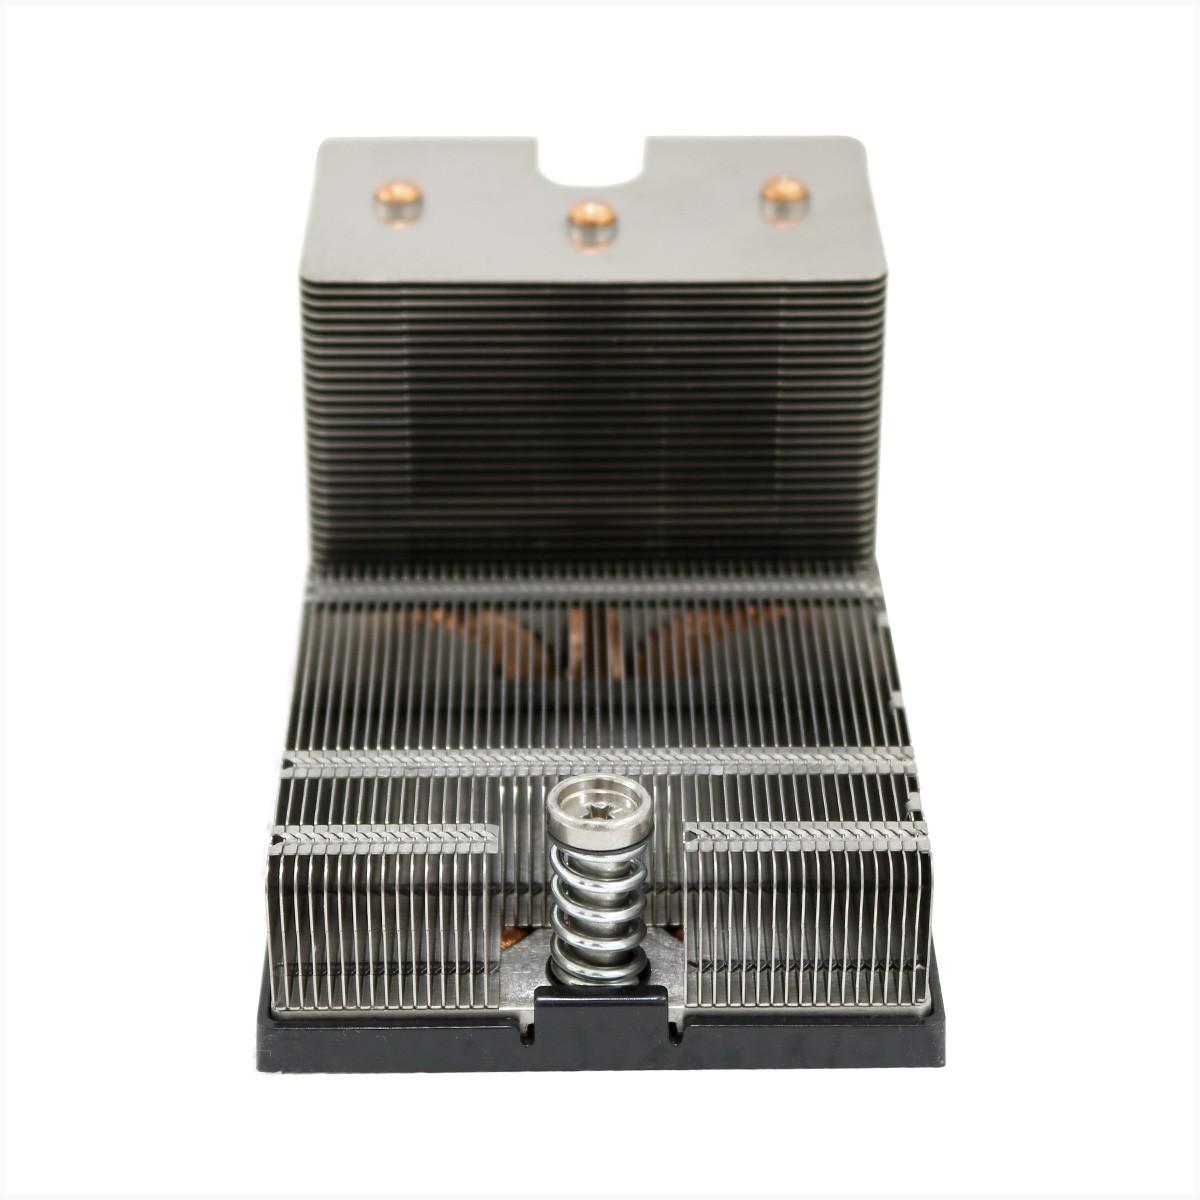 Dissipador para servidor dell r720 r720xd -  usado